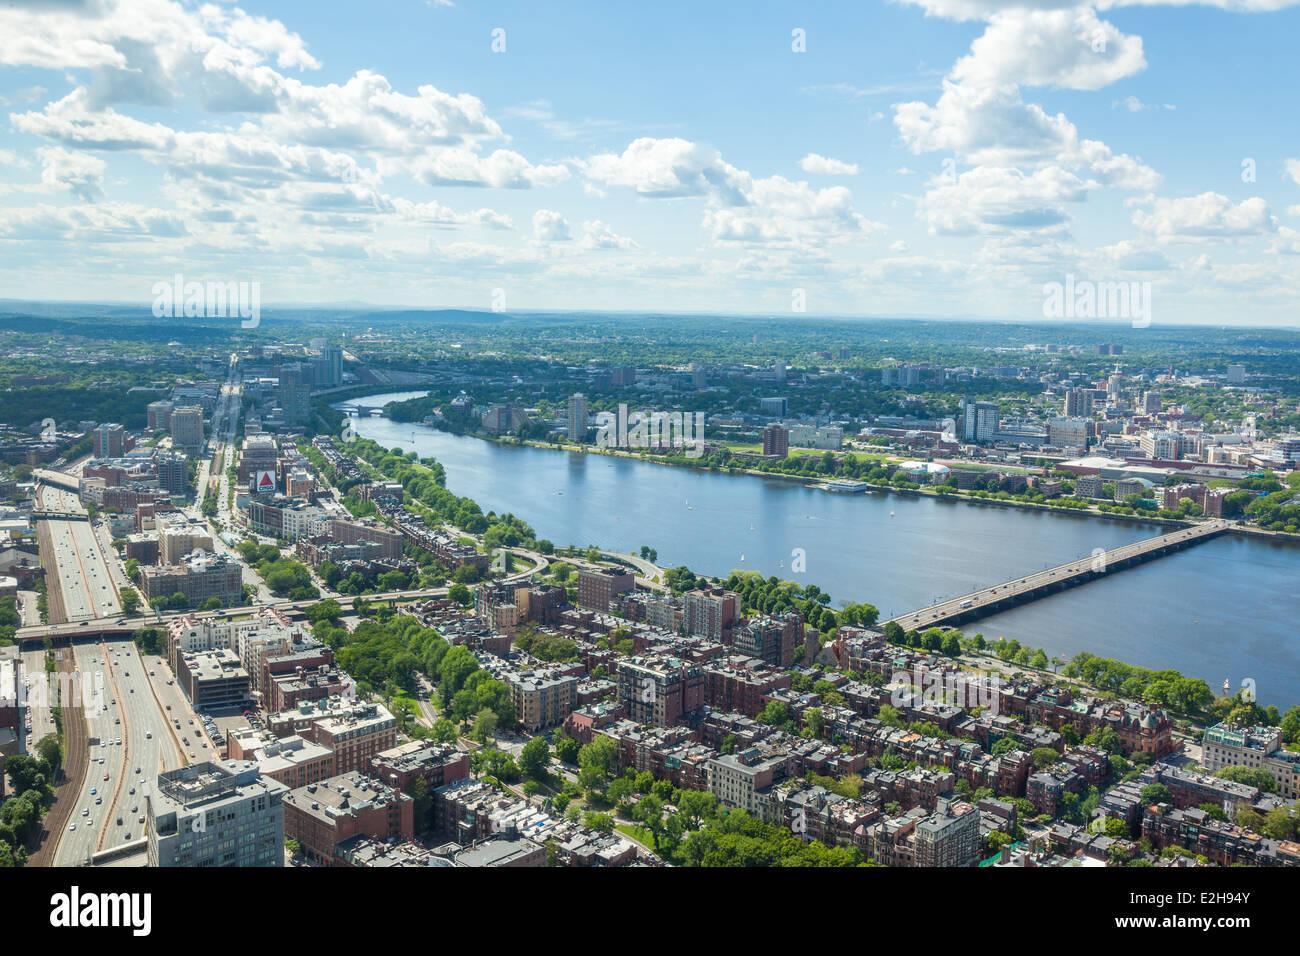 Vista aérea del horizonte de Boston, Massachusetts, EE.UU. Imagen De Stock